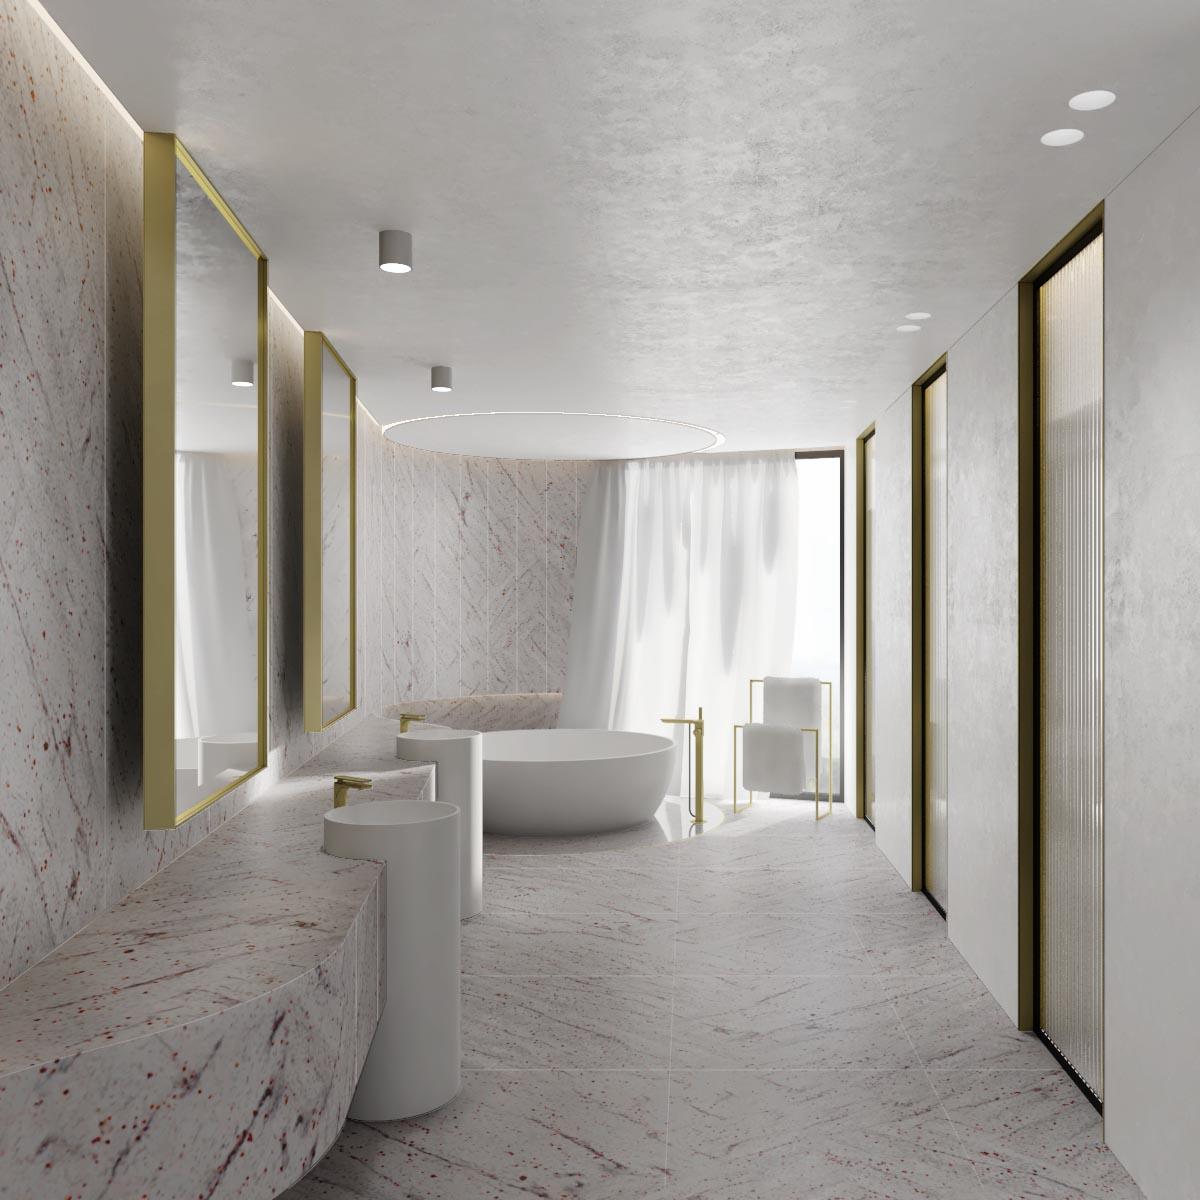 Taylor_Pressly_Architects_Toorak_Residence.jpg